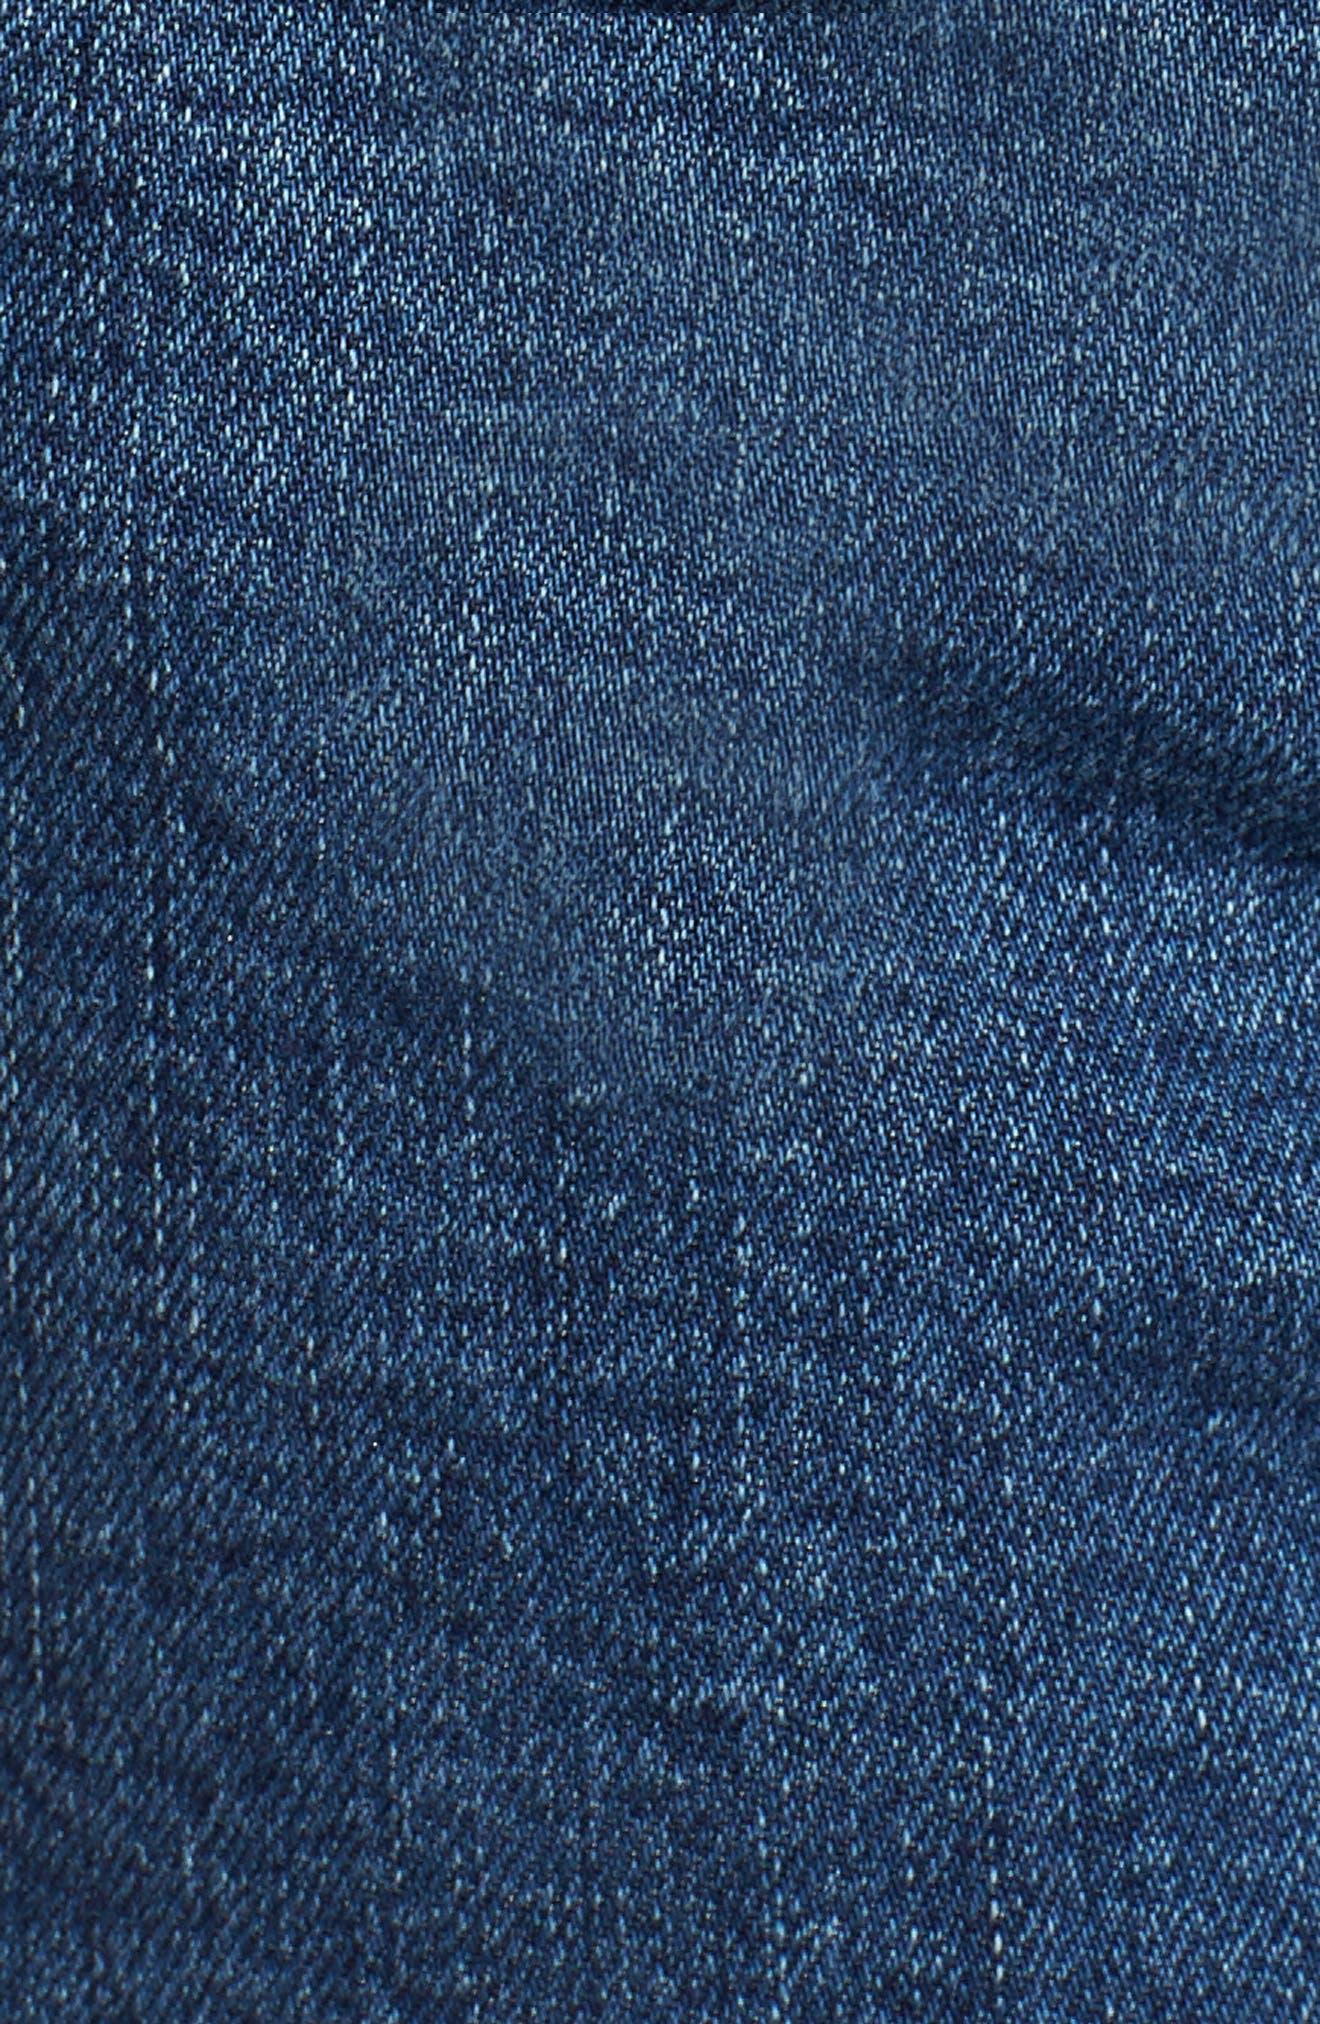 High Waist Cutoff Denim Shorts,                             Alternate thumbnail 6, color,                             400